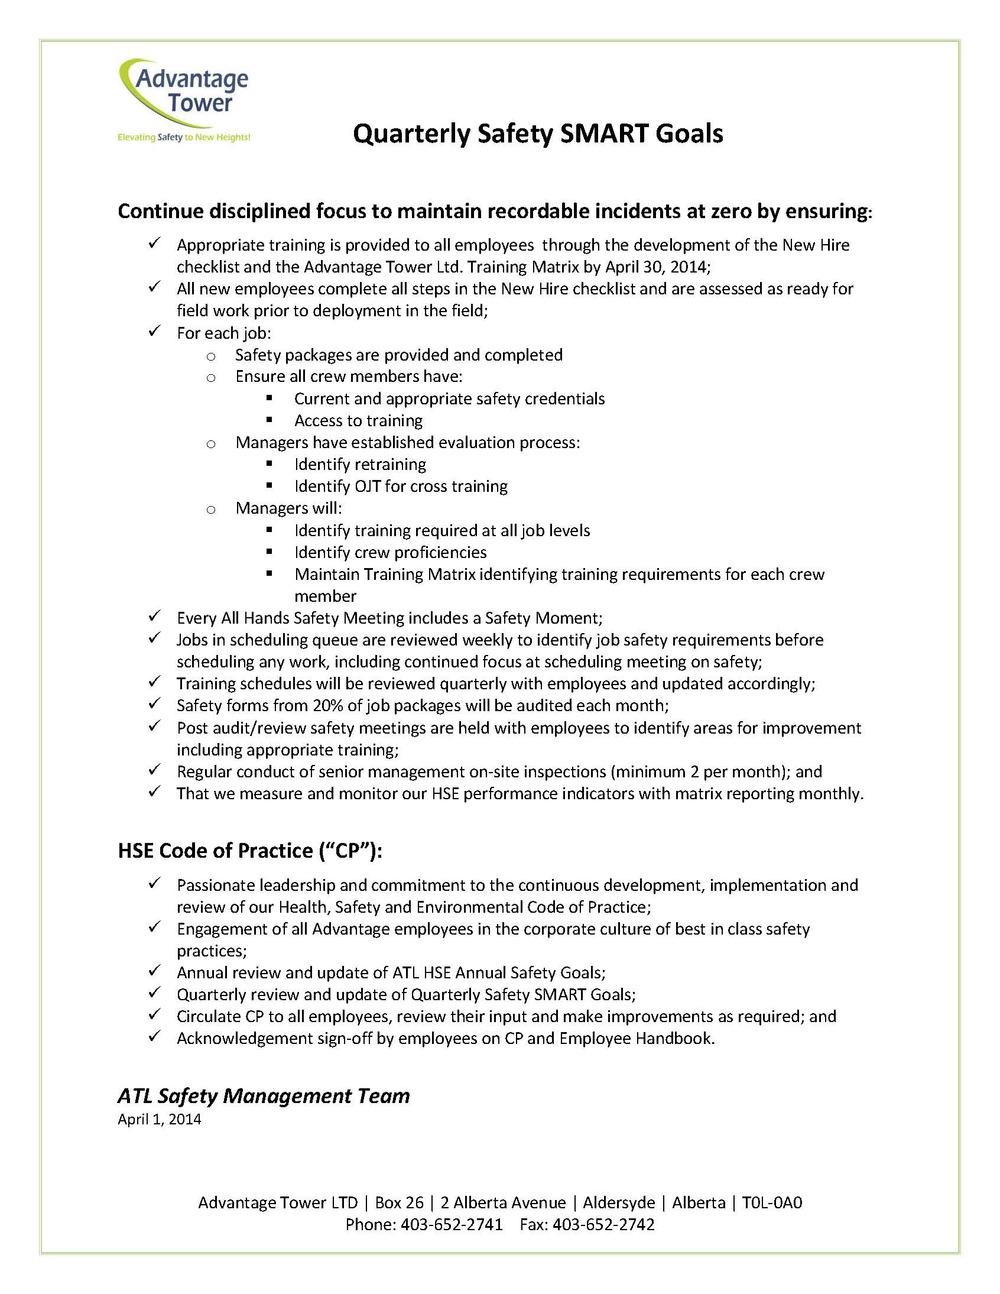 ATL Quarterly Safety SMART Goals April 1 2014.jpg